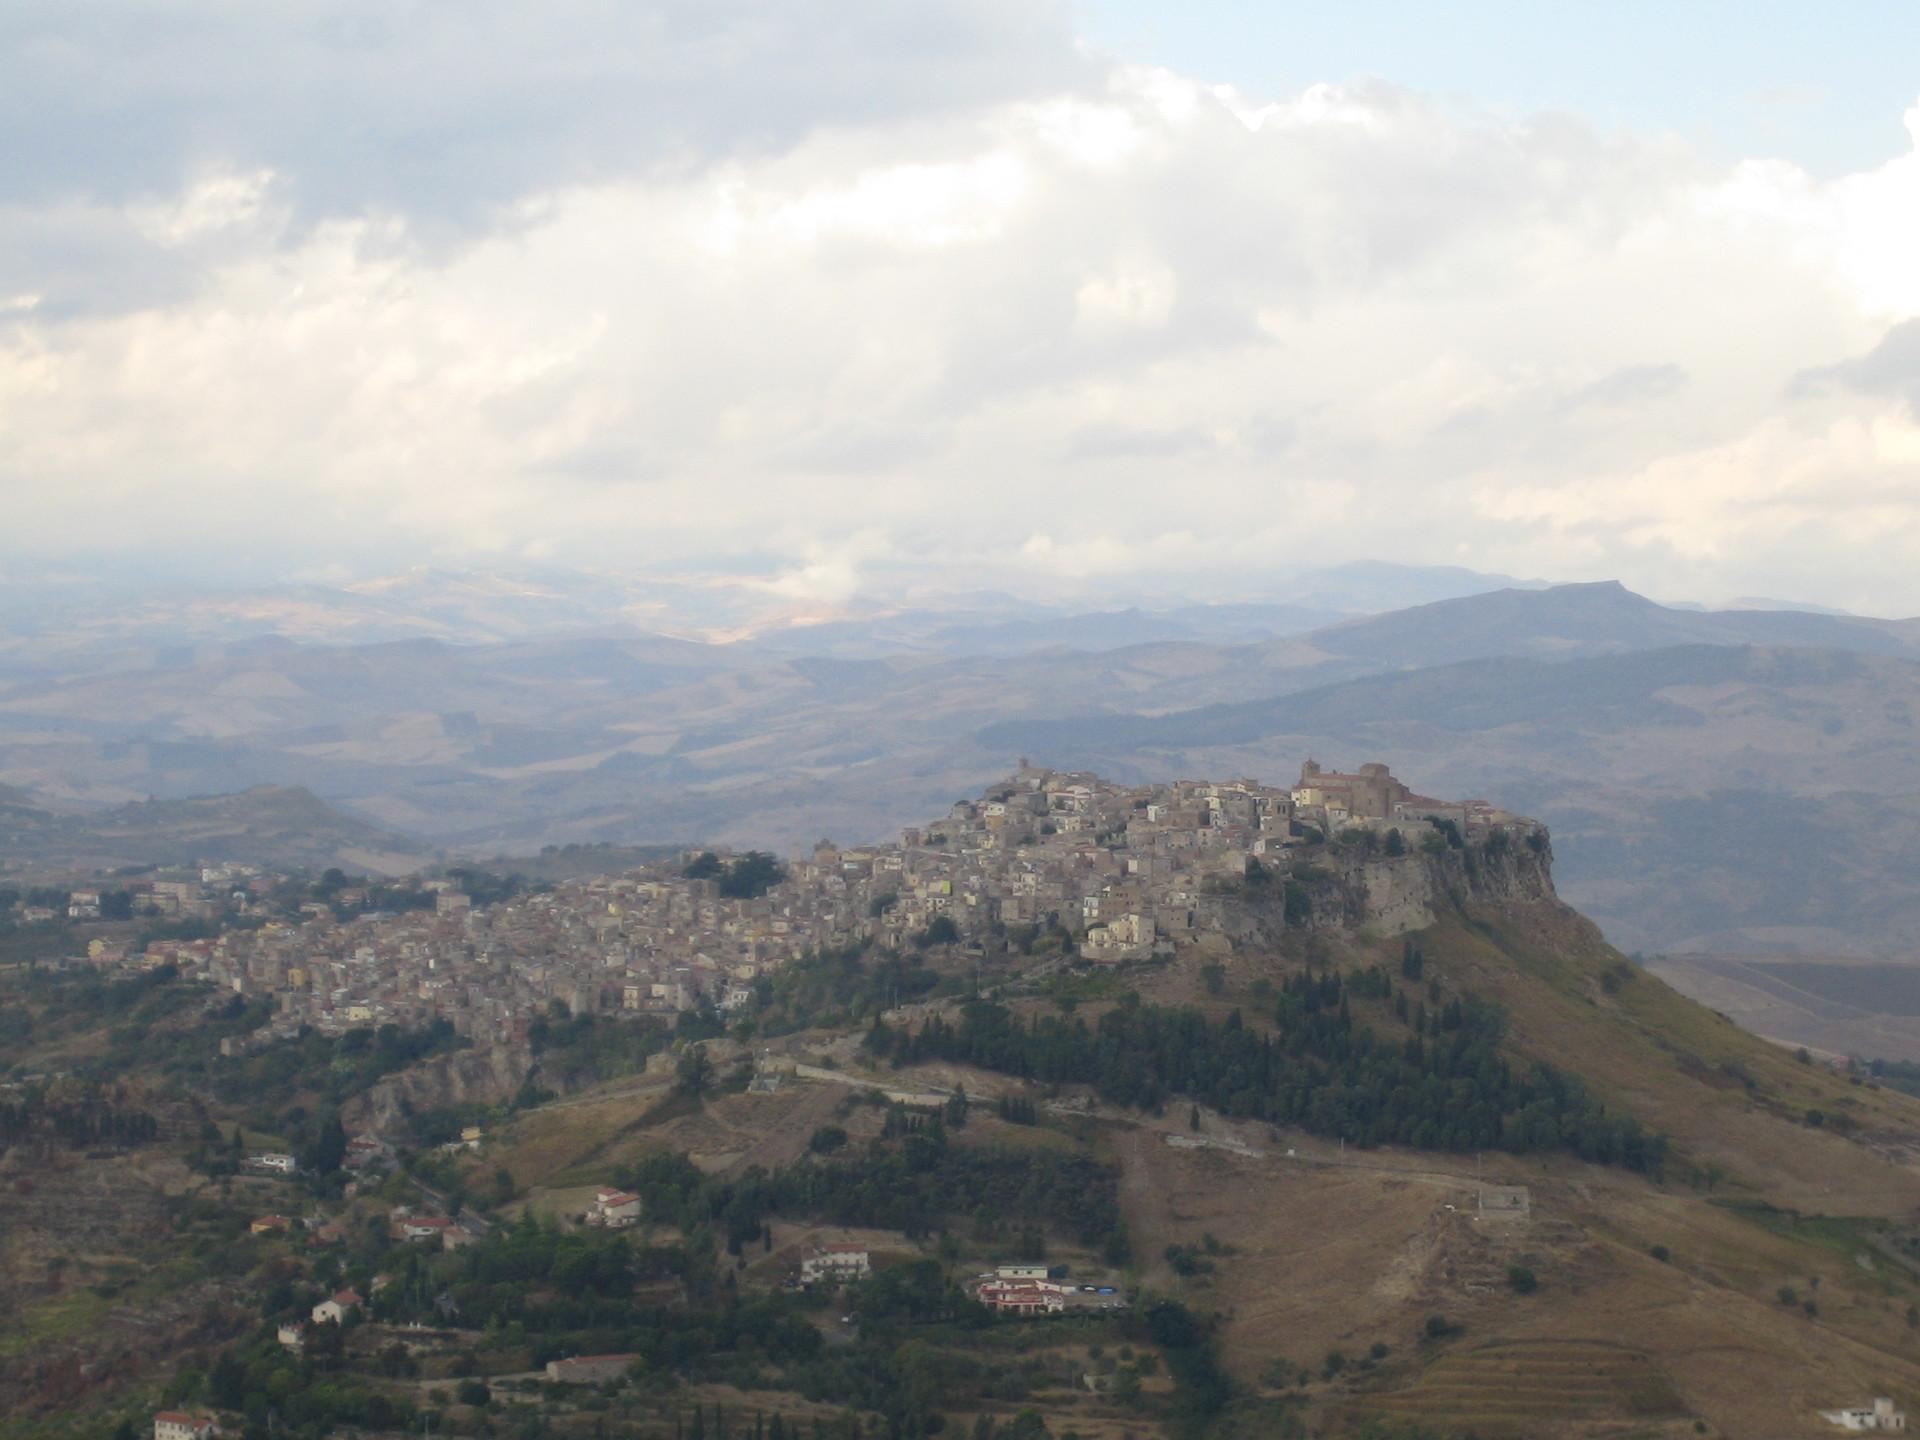 mountains-enna-3e644f490d49a369c9a7c3f44